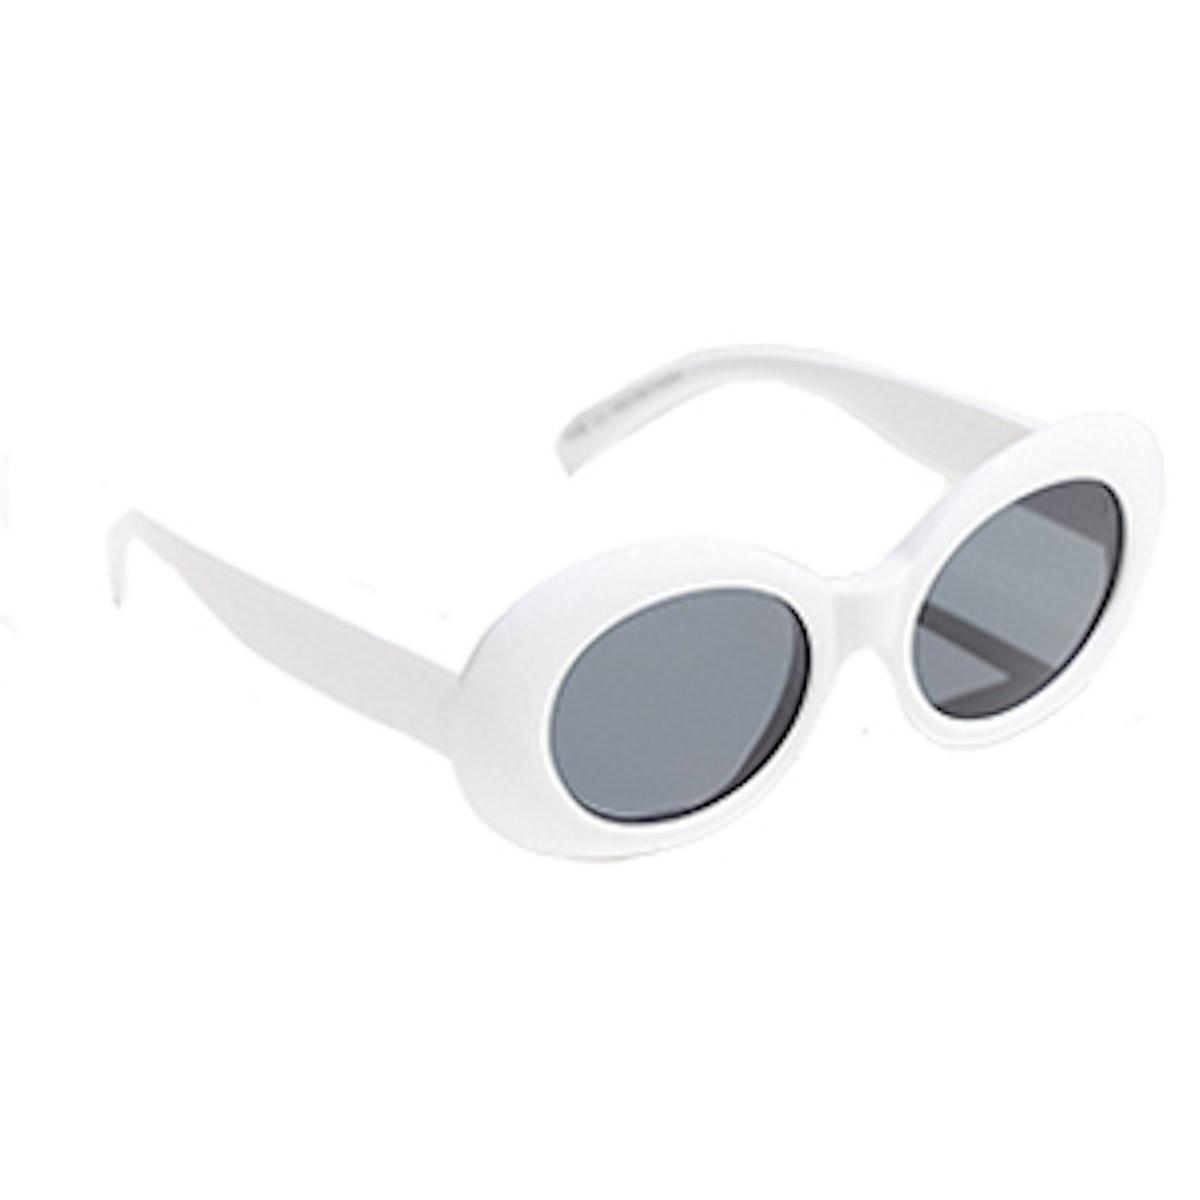 Venice Oval Sunglasses